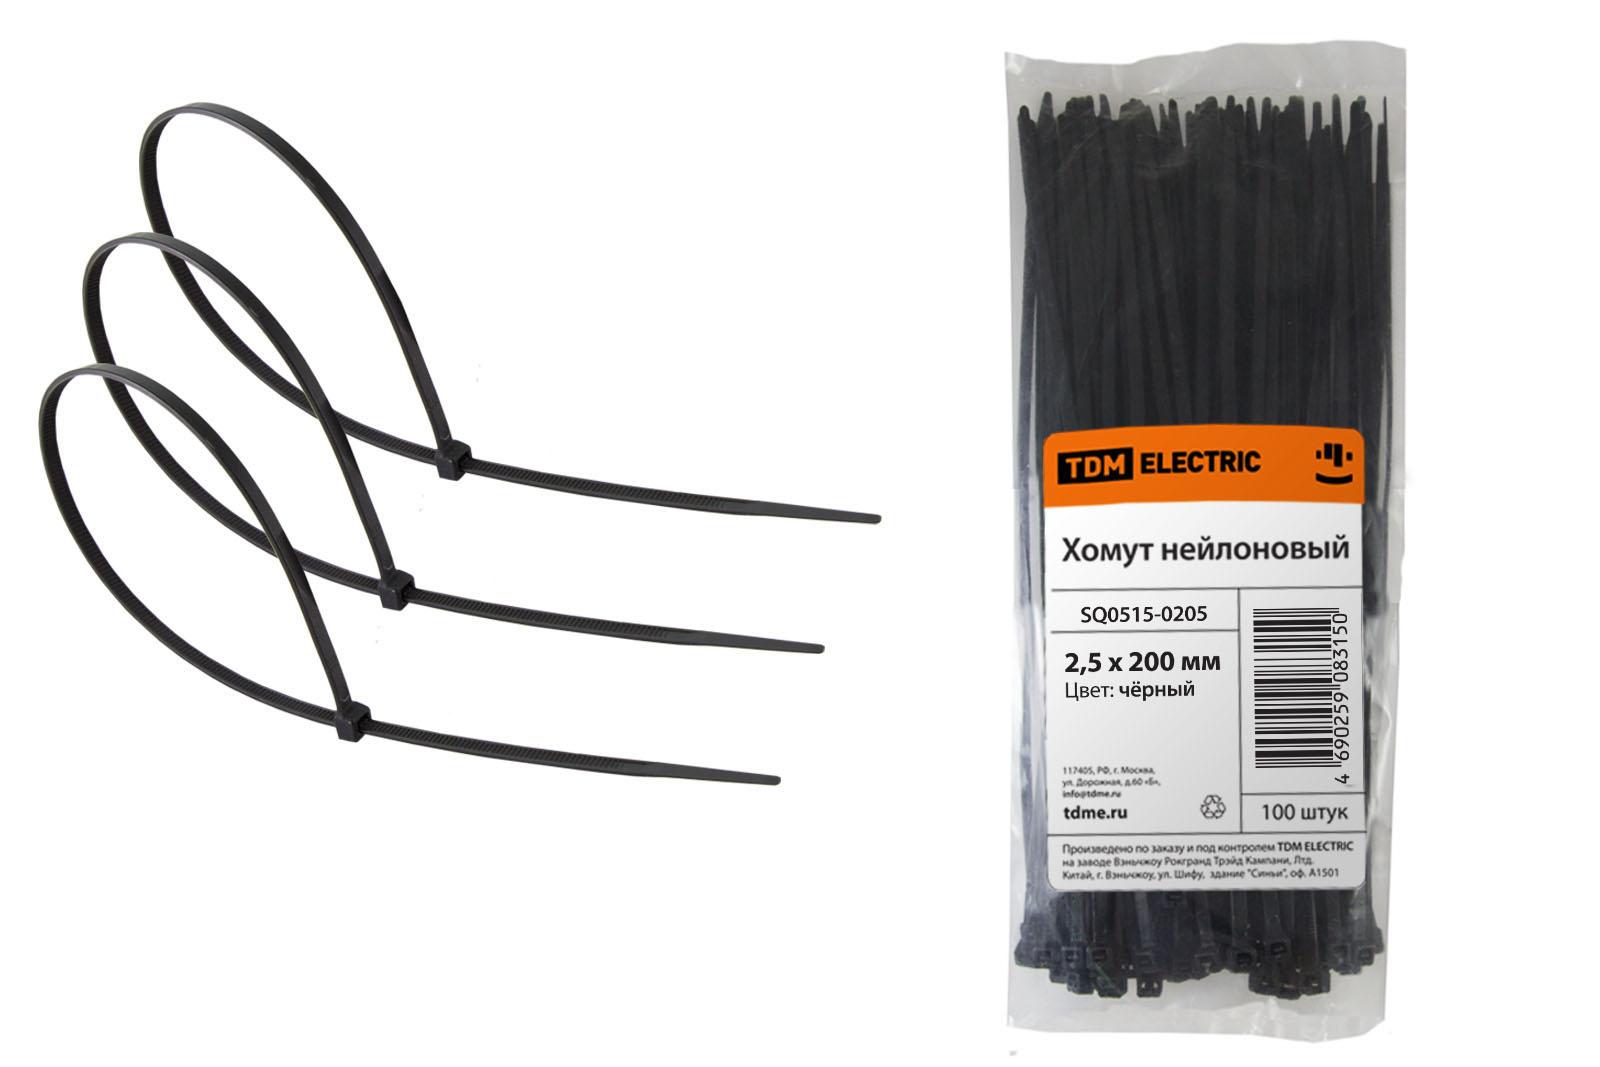 Хомут 2,5х200мм нейлон (черный) (100шт) TDM SQ0515-0205 TDM Electric